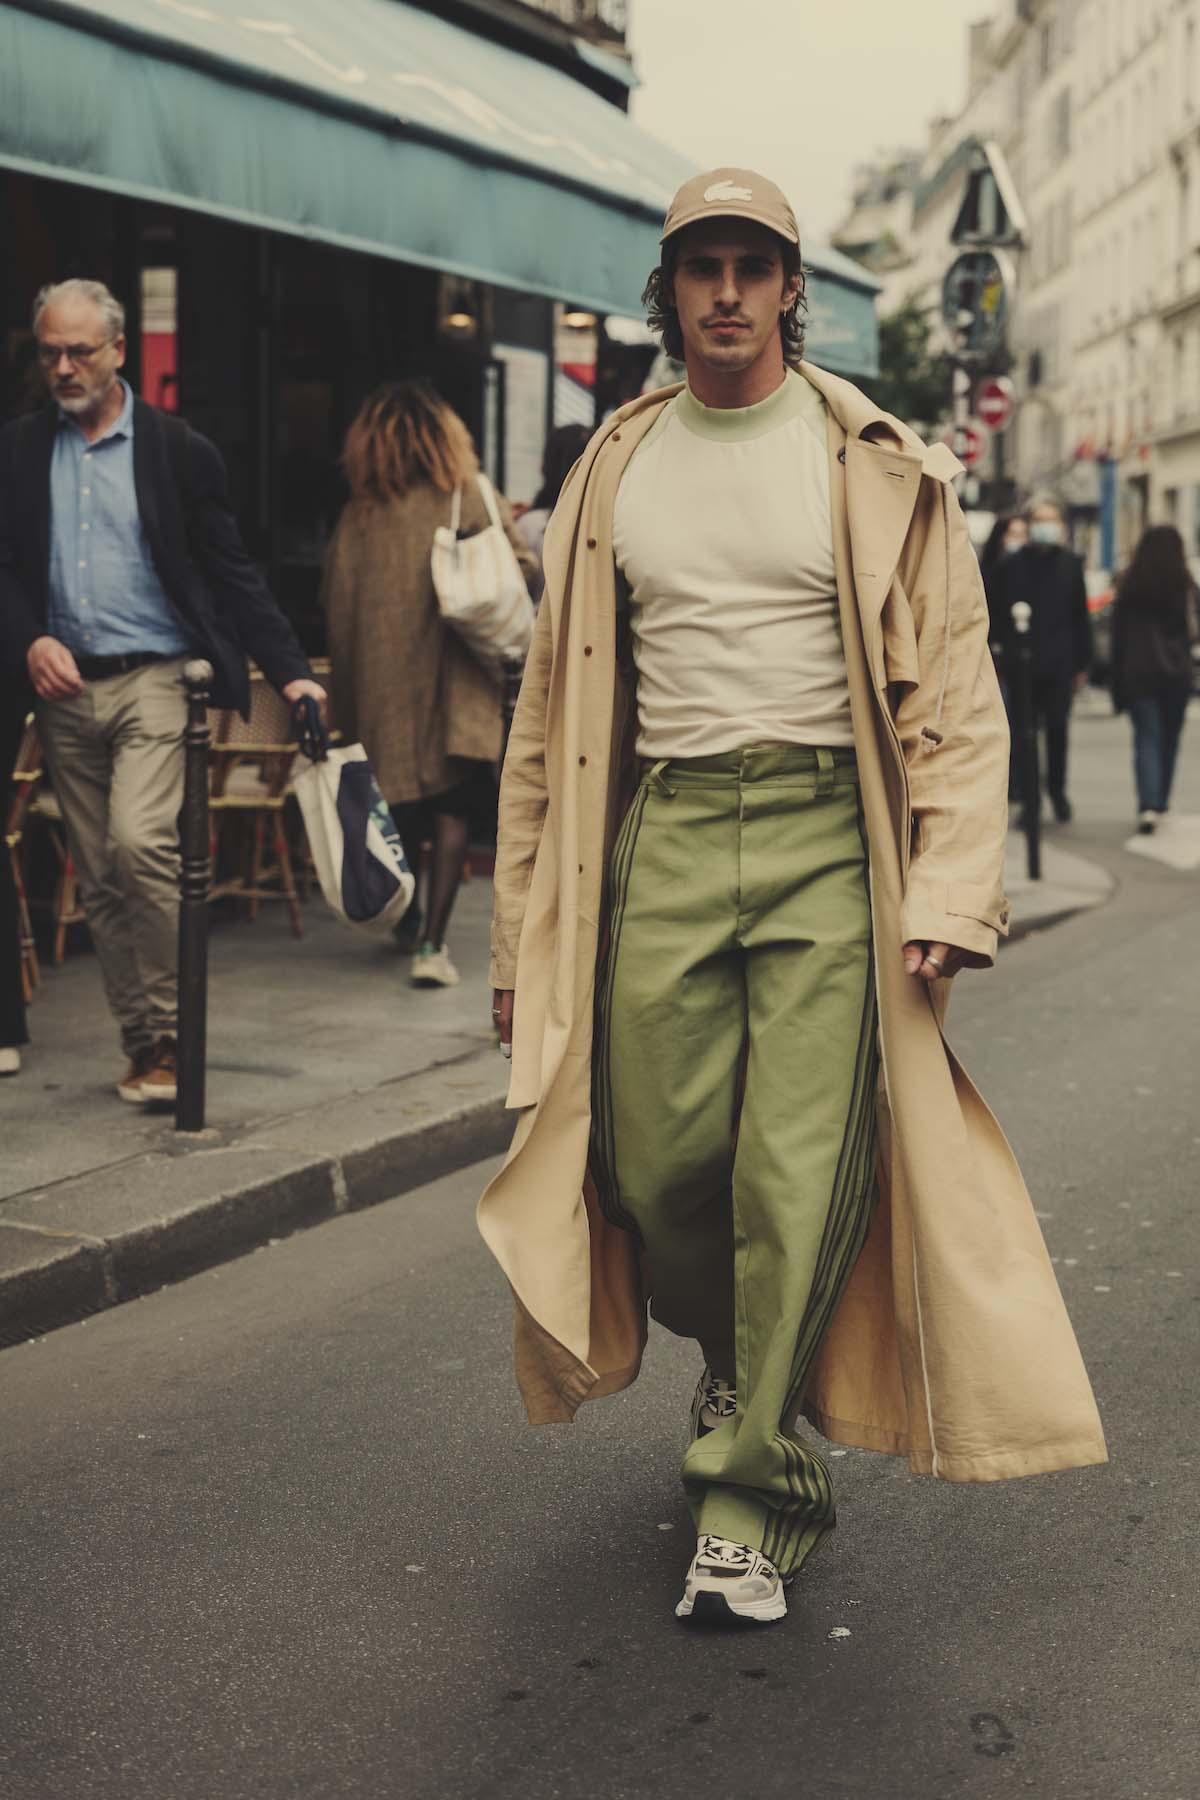 matthias-geertsr tuần lễ thời trang paris